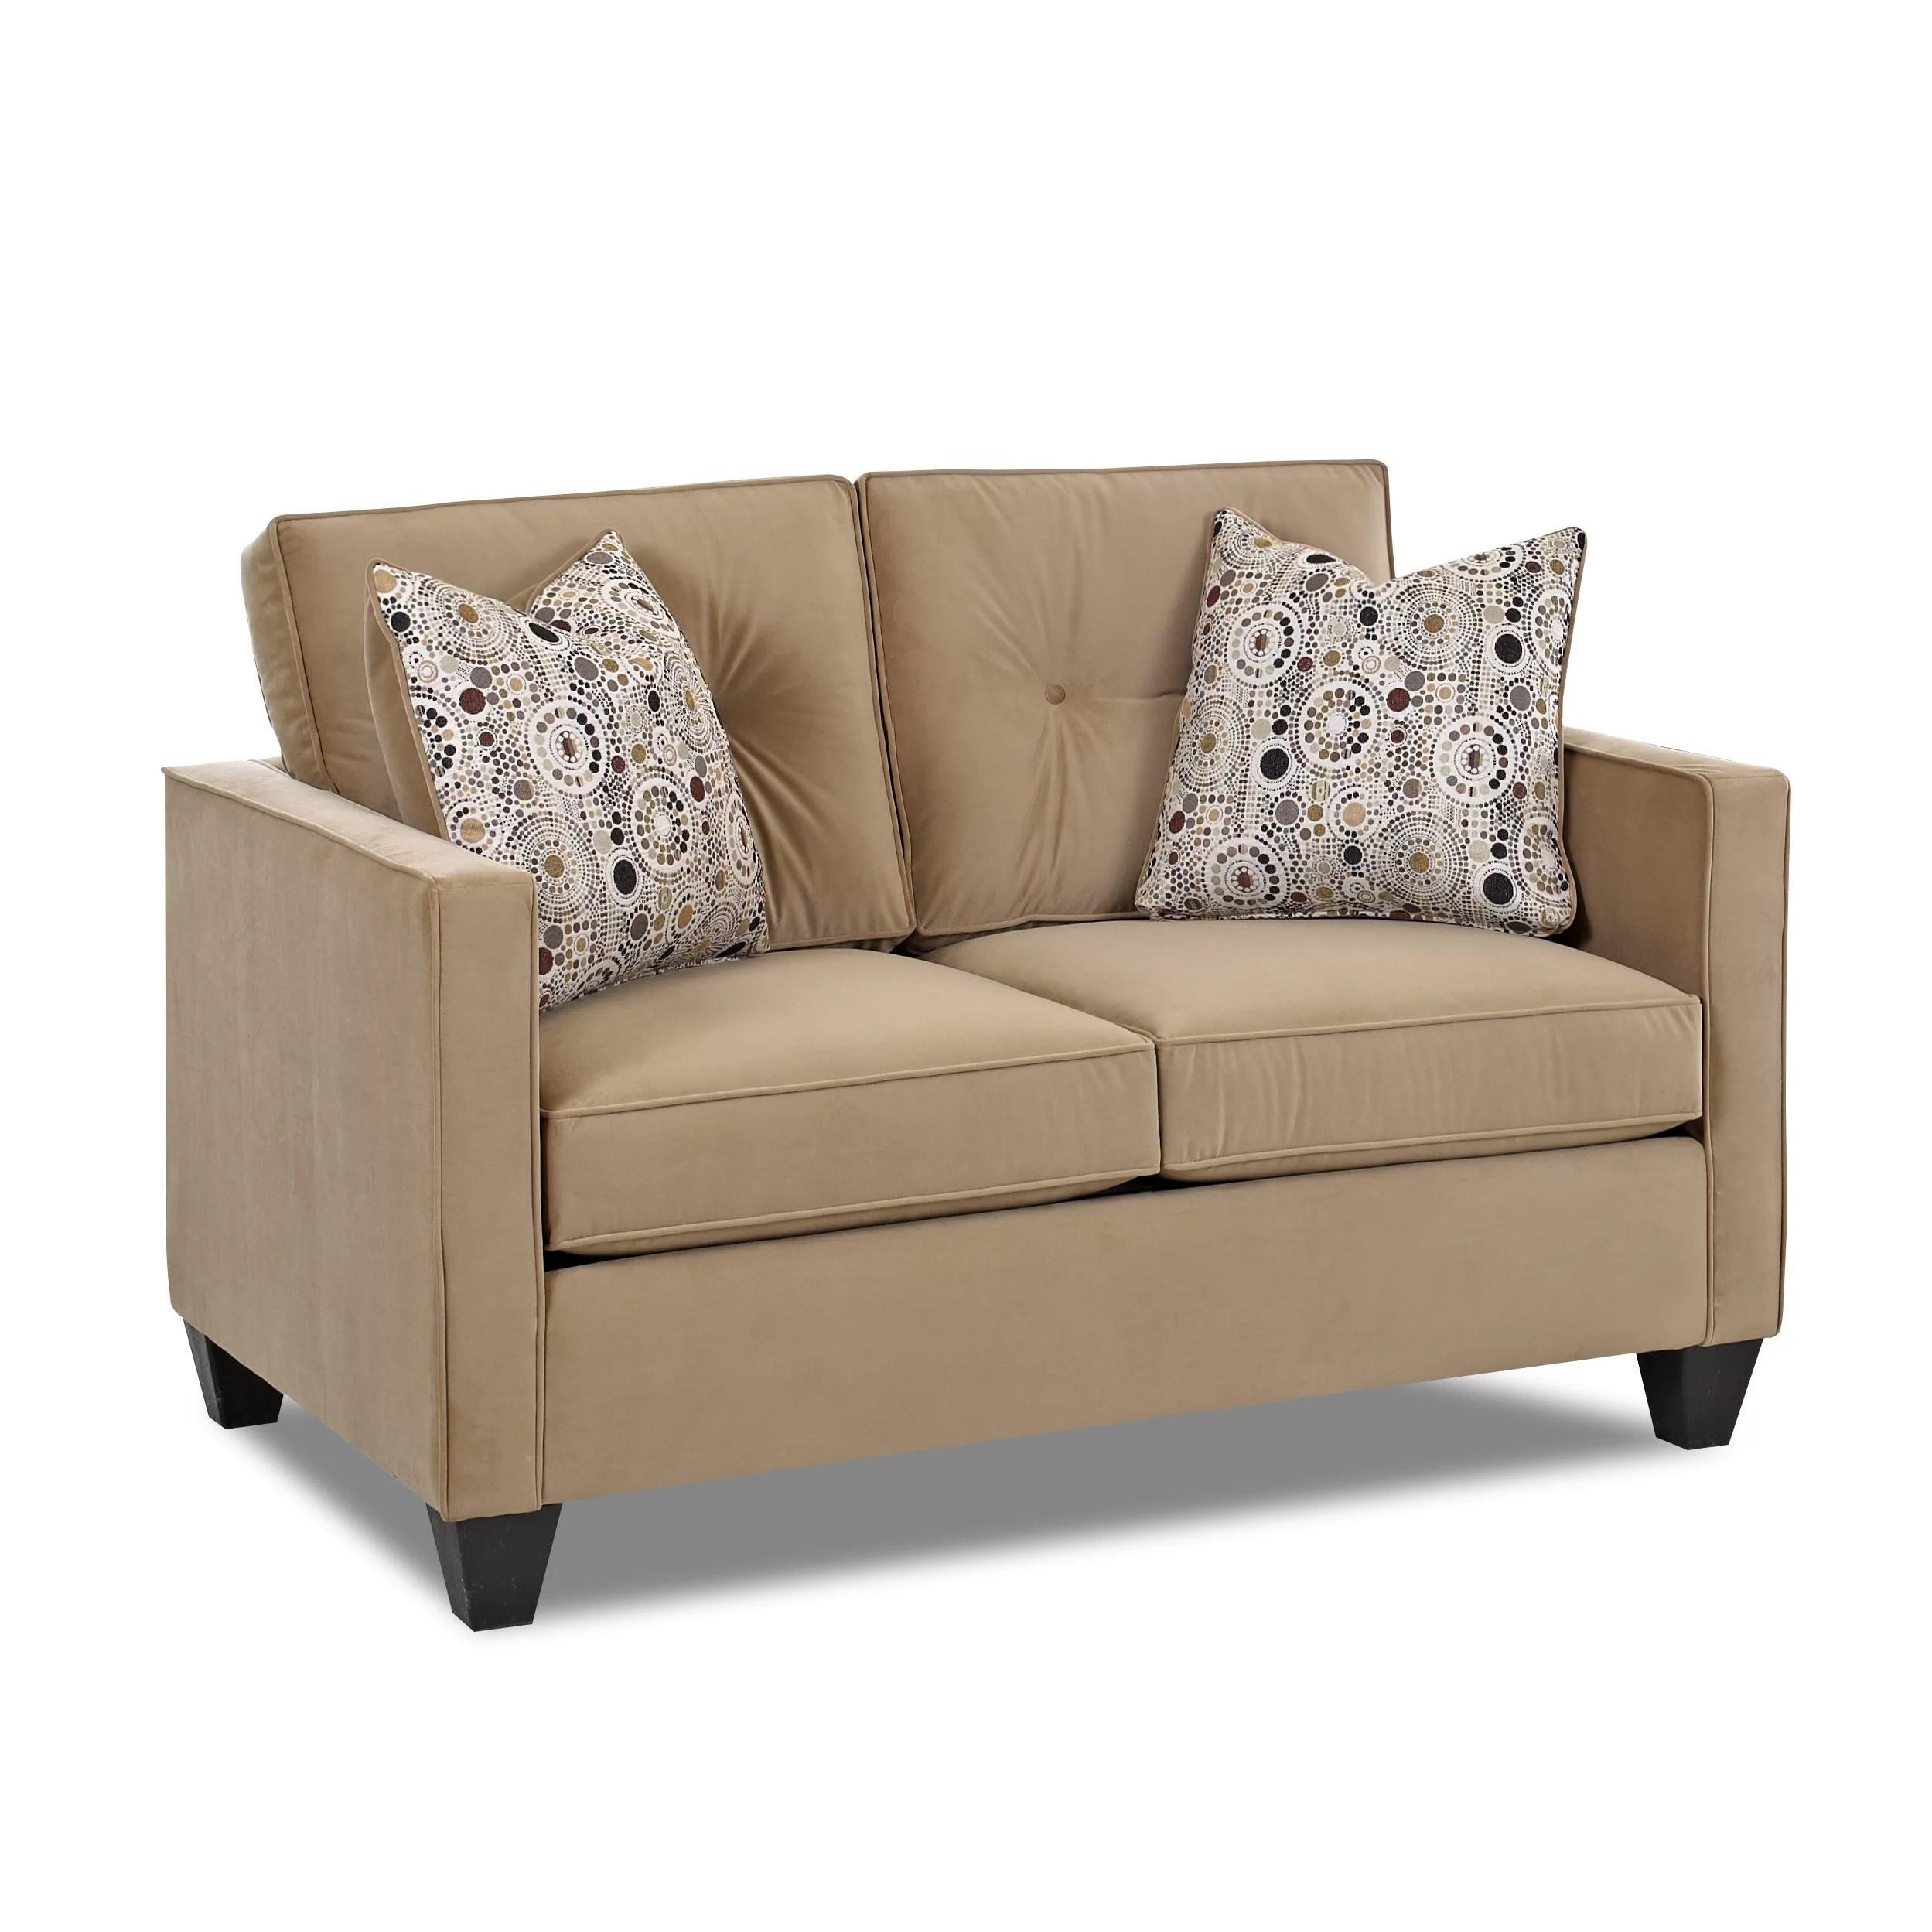 klaussner sofa and loveseat set power recliner not working furniture derry reviews wayfair